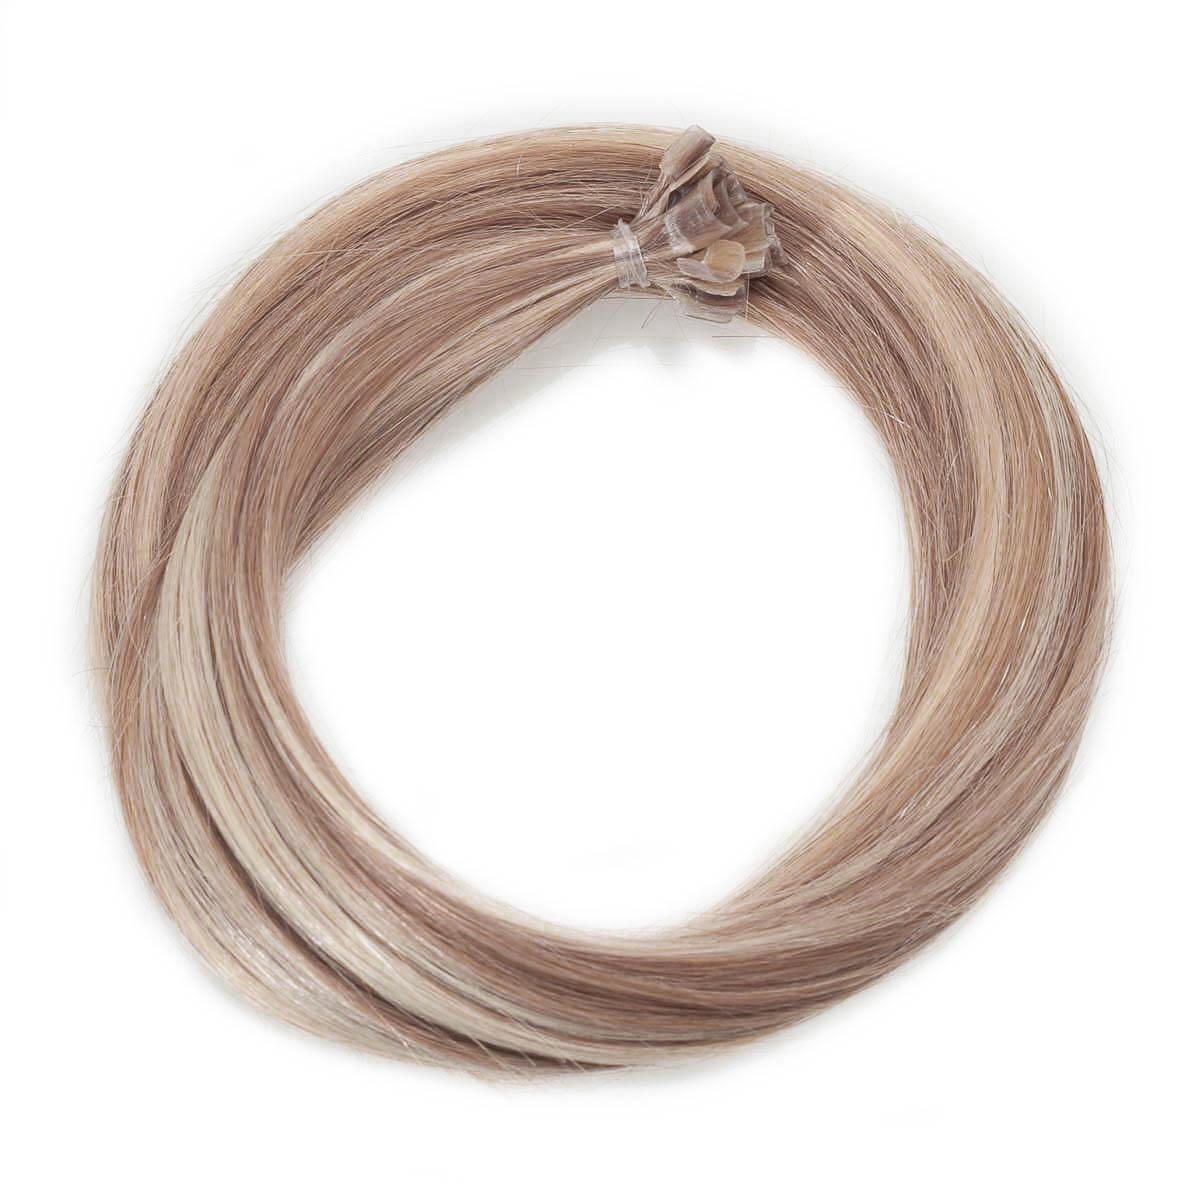 Nail Hair Premium M7.3/10.8 Cendre Ash Blonde Mix 30 cm